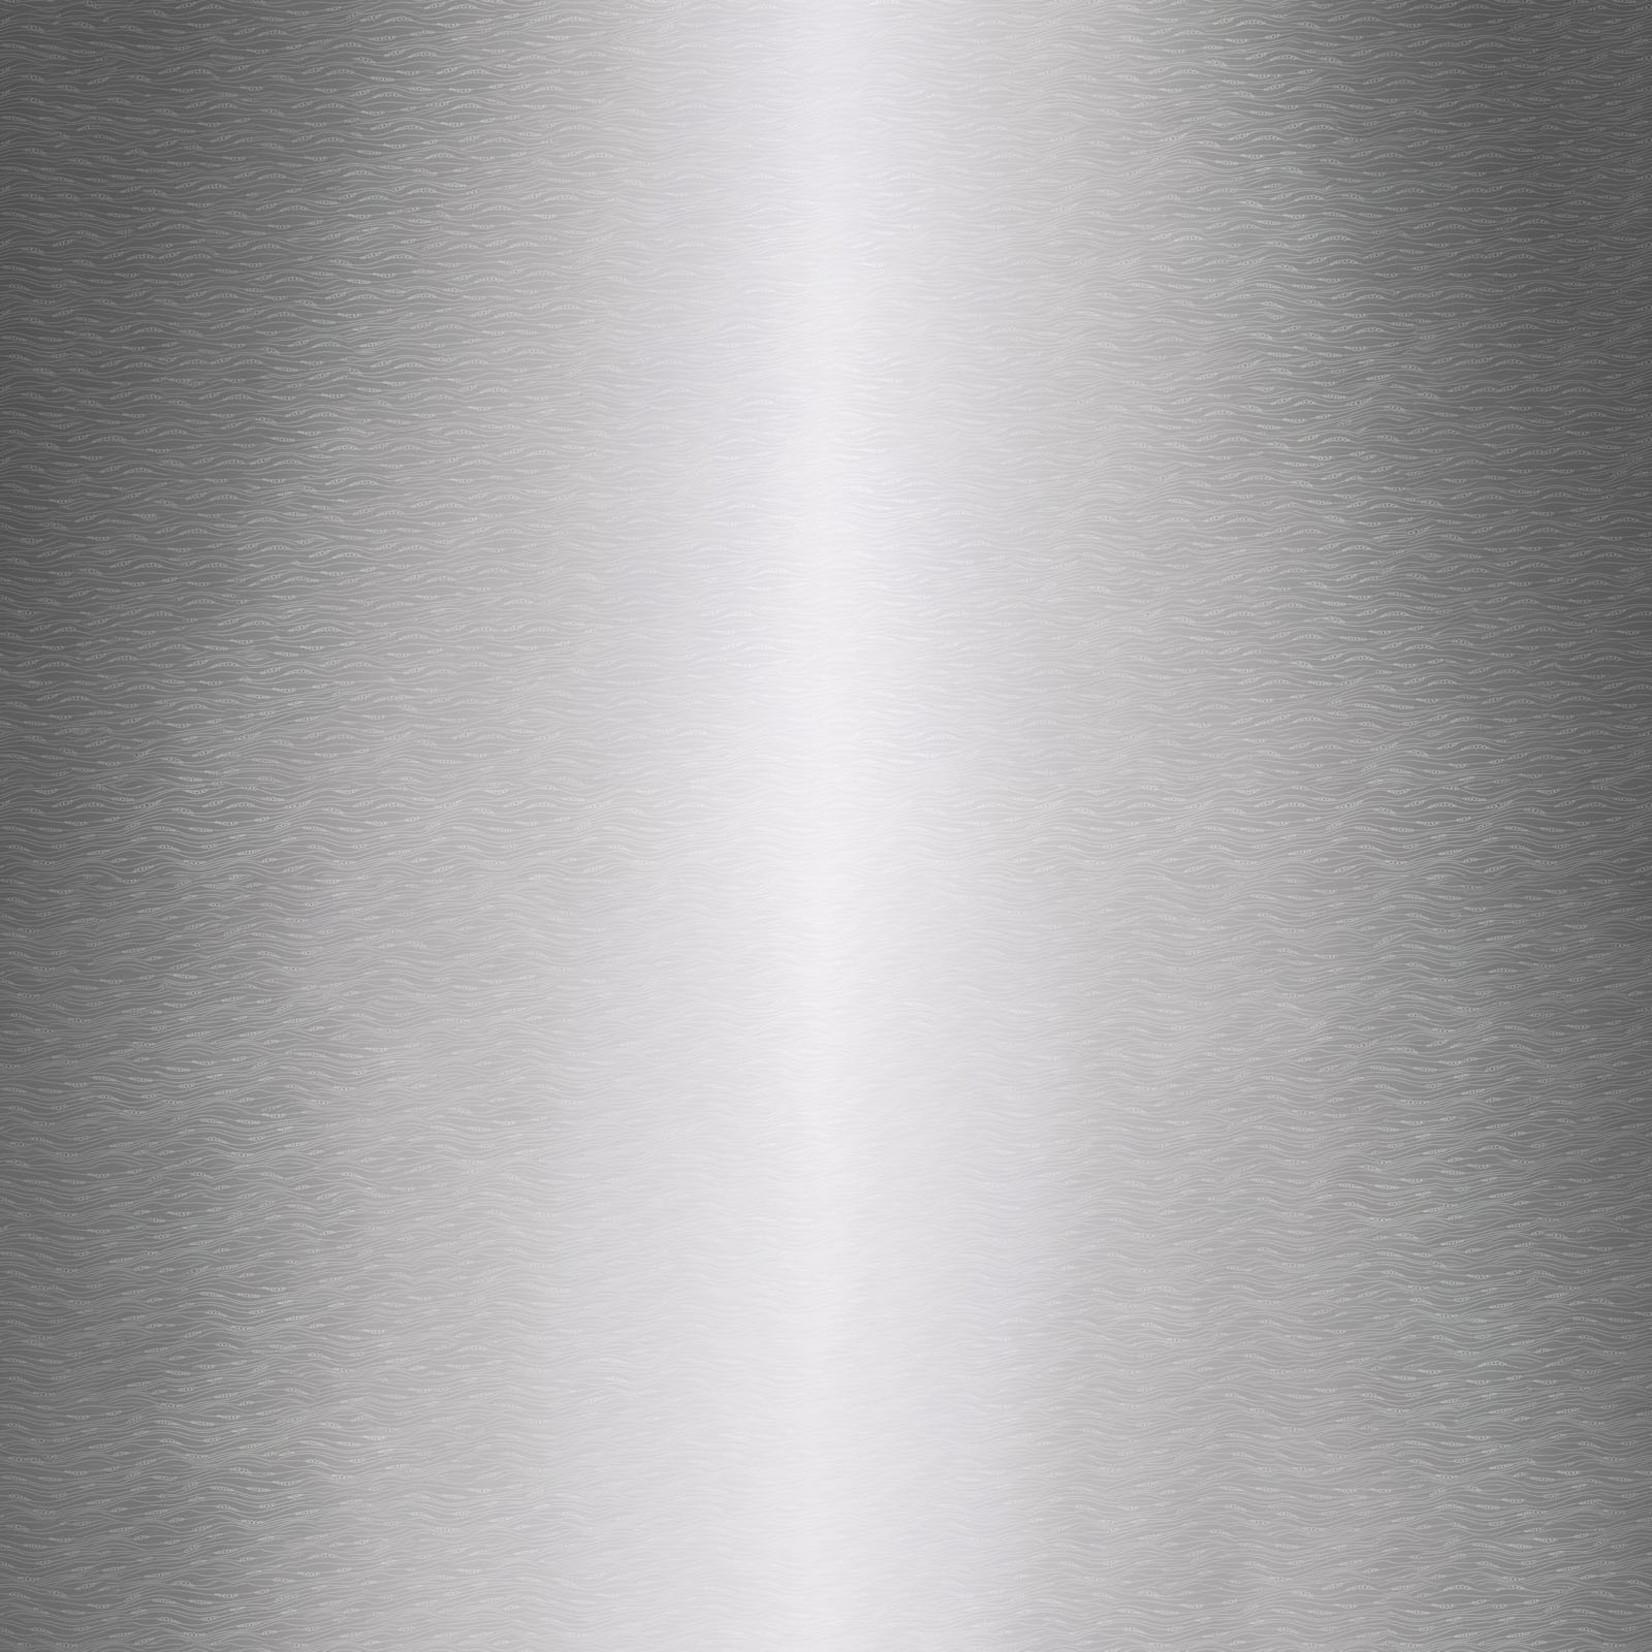 MAYWOOD MOONGATE, HORIZON OMBRÉ Grey, per cm or $18/m